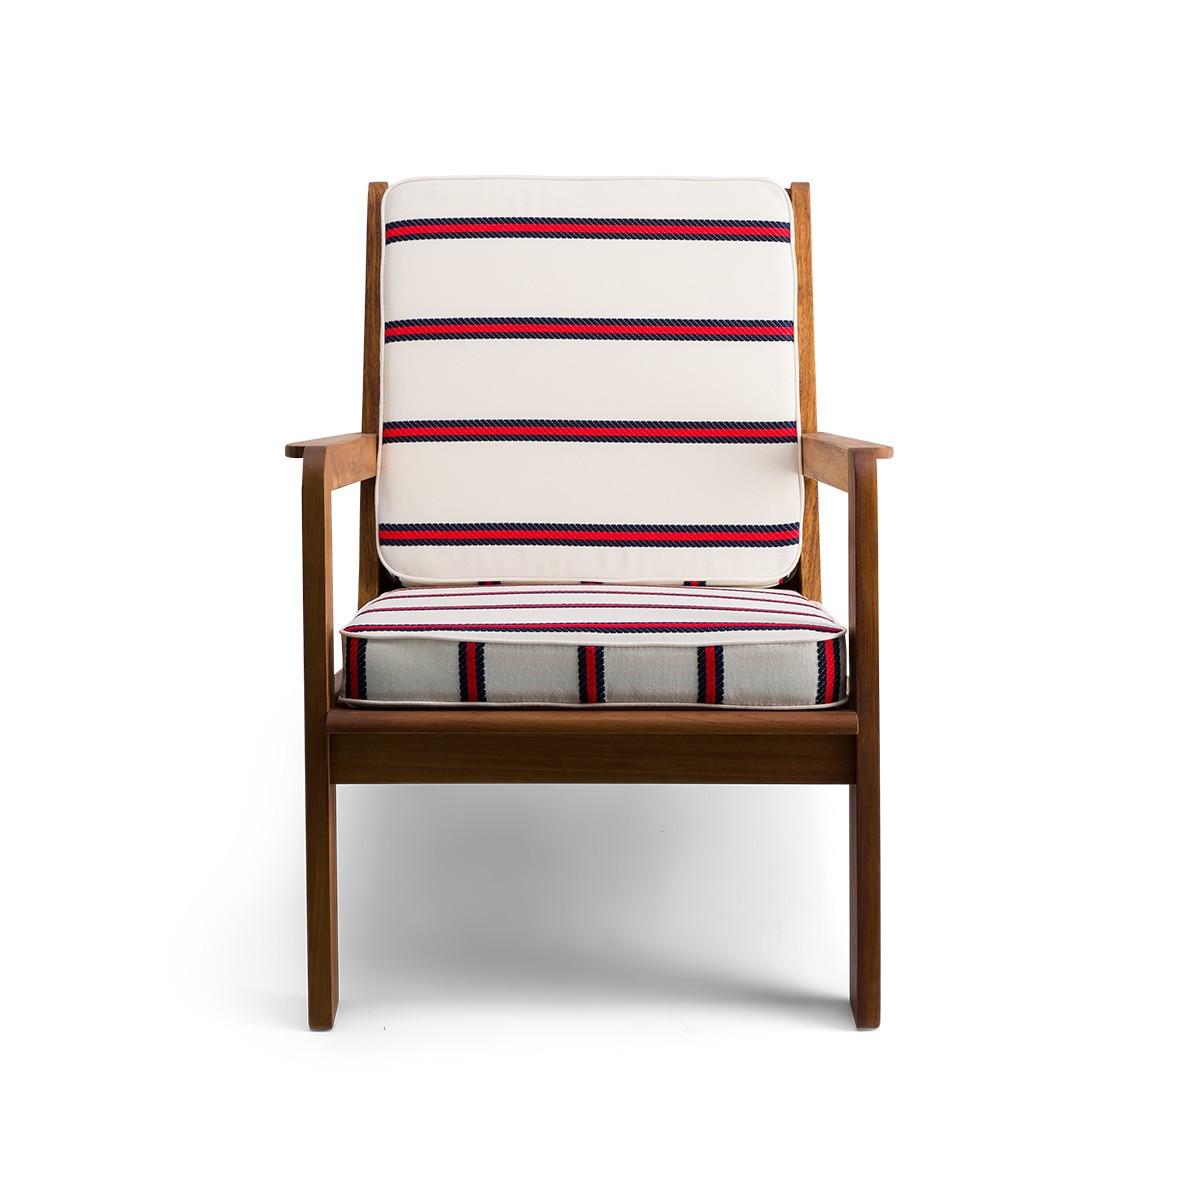 Gloria fireside chair brown wood, striped navy red Dedar fabric